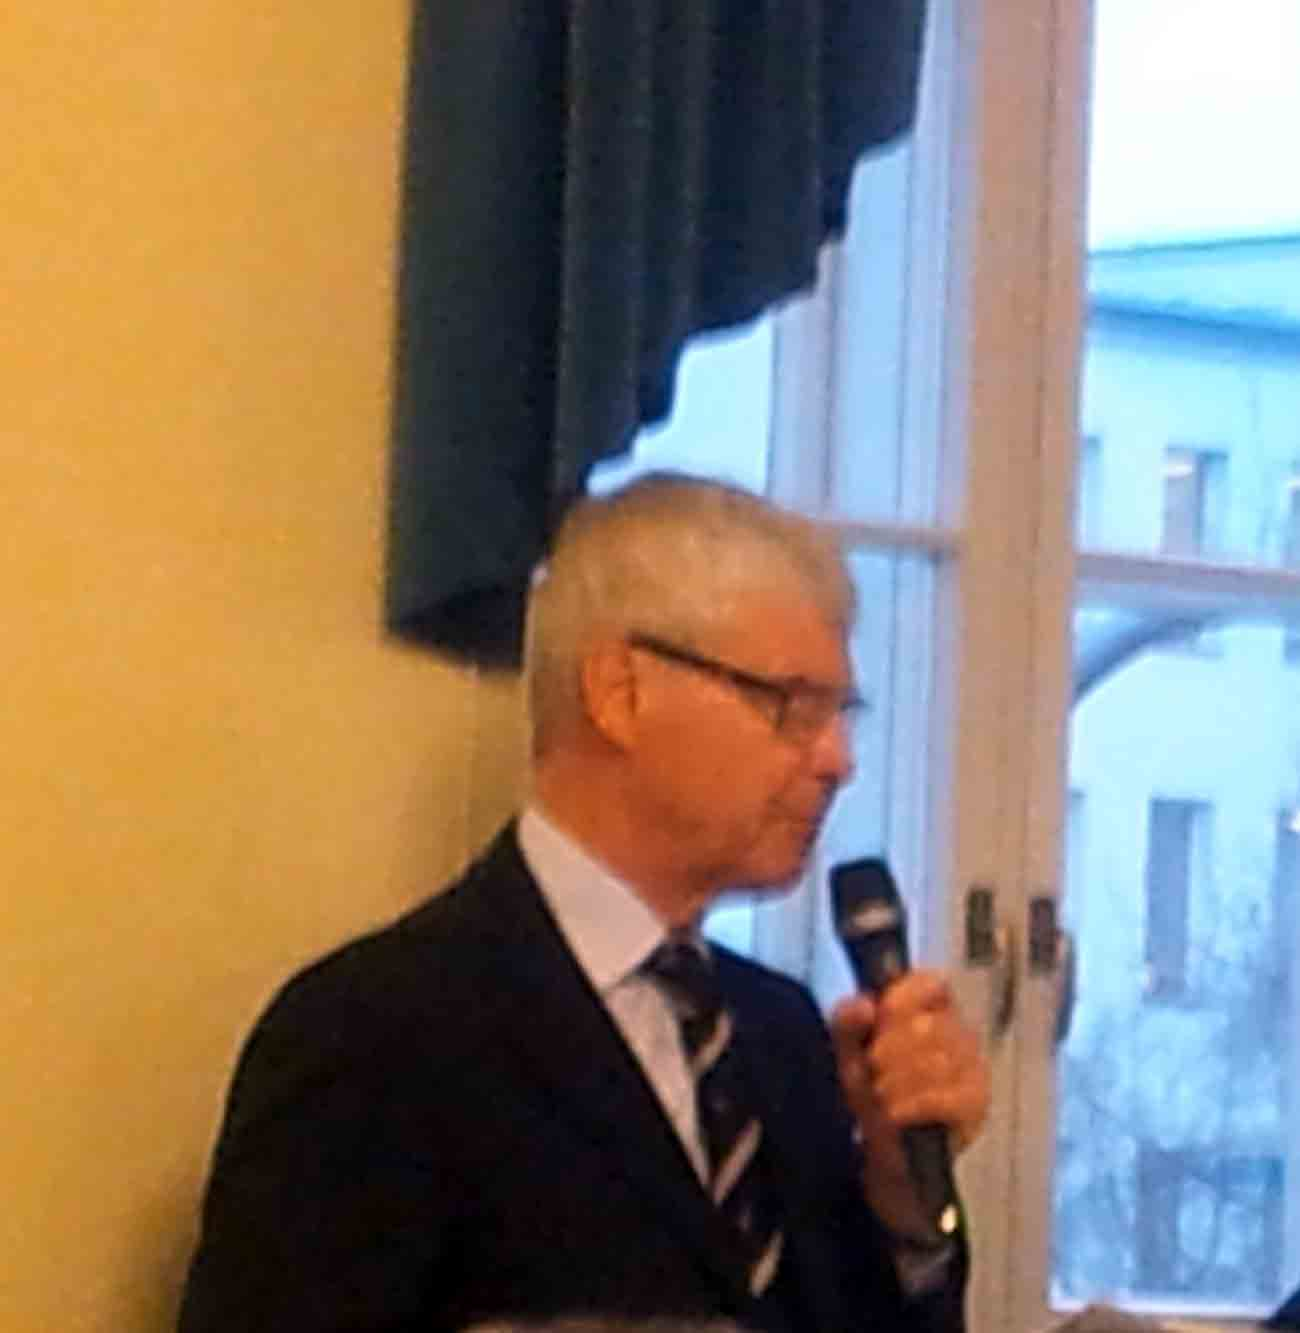 Rolf Henrik Richard Lax salary